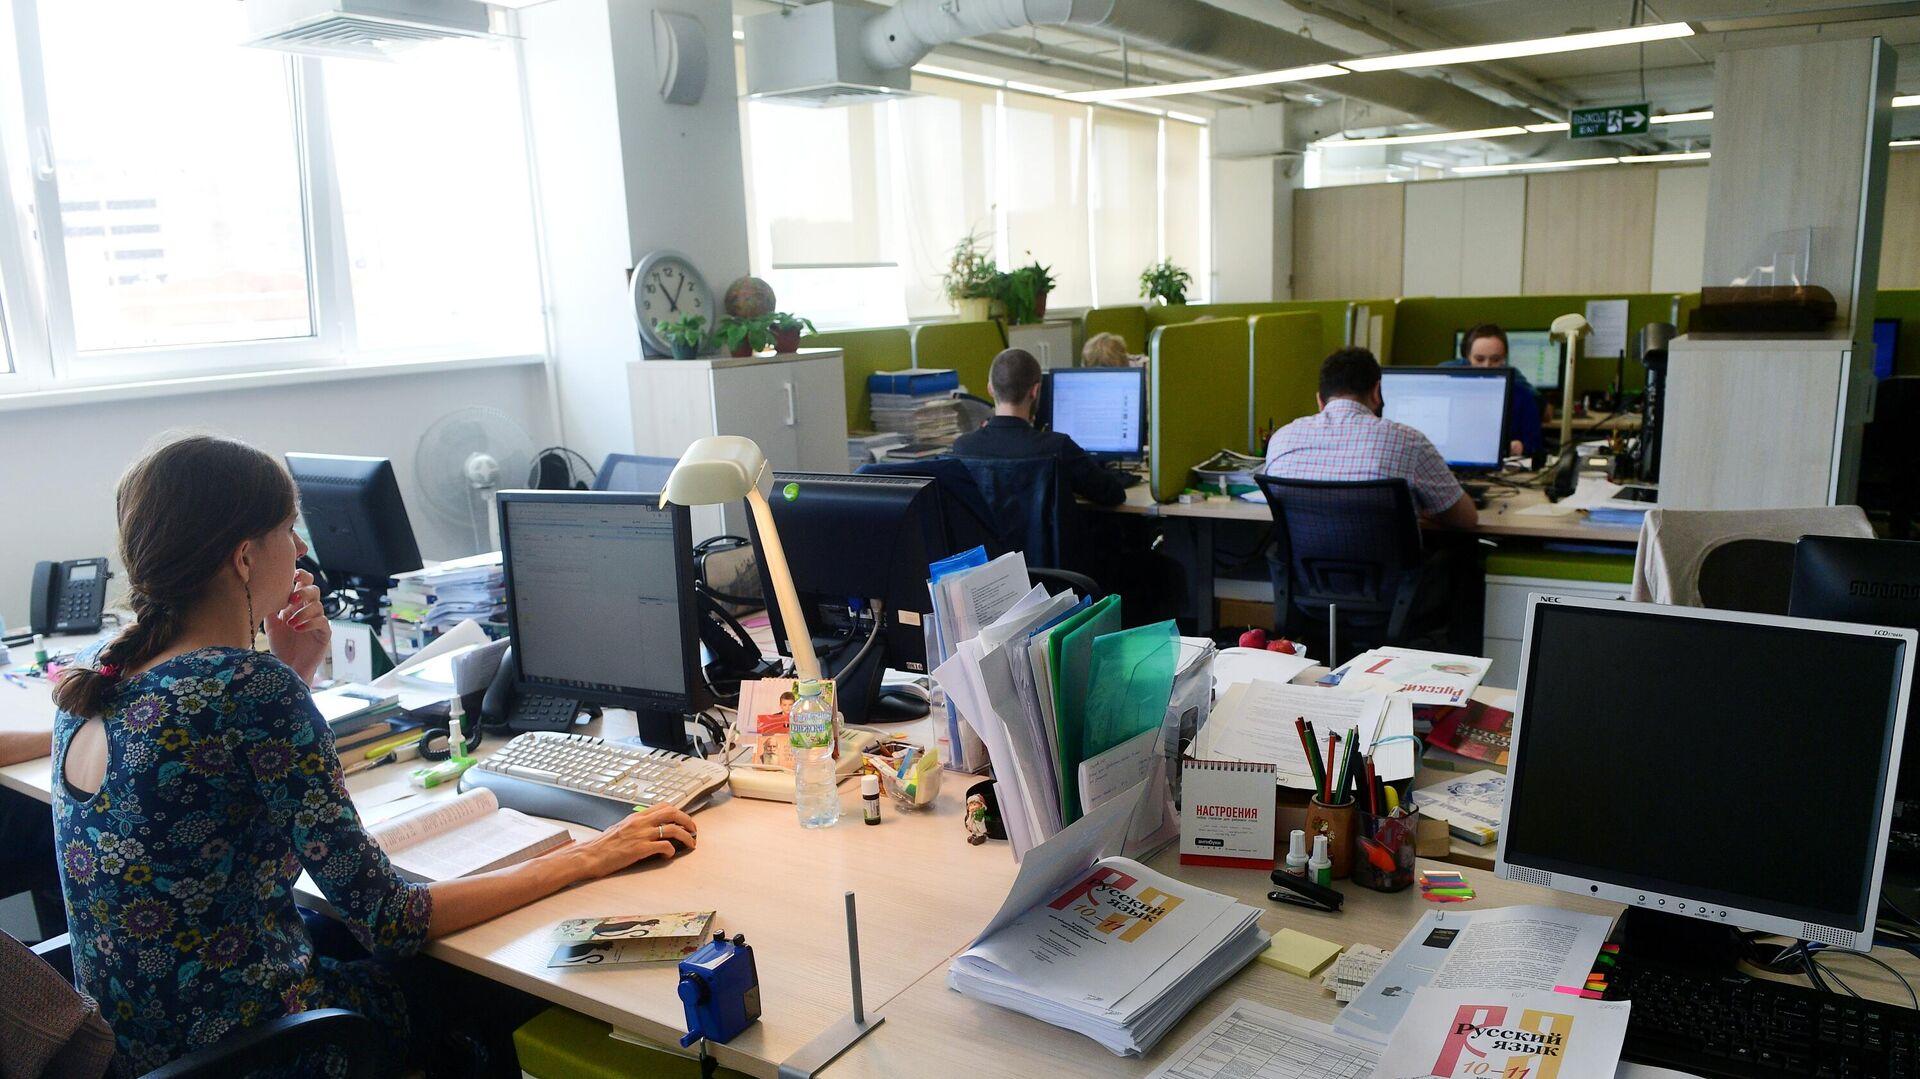 Сотрудники в офисе - РИА Новости, 1920, 05.08.2021